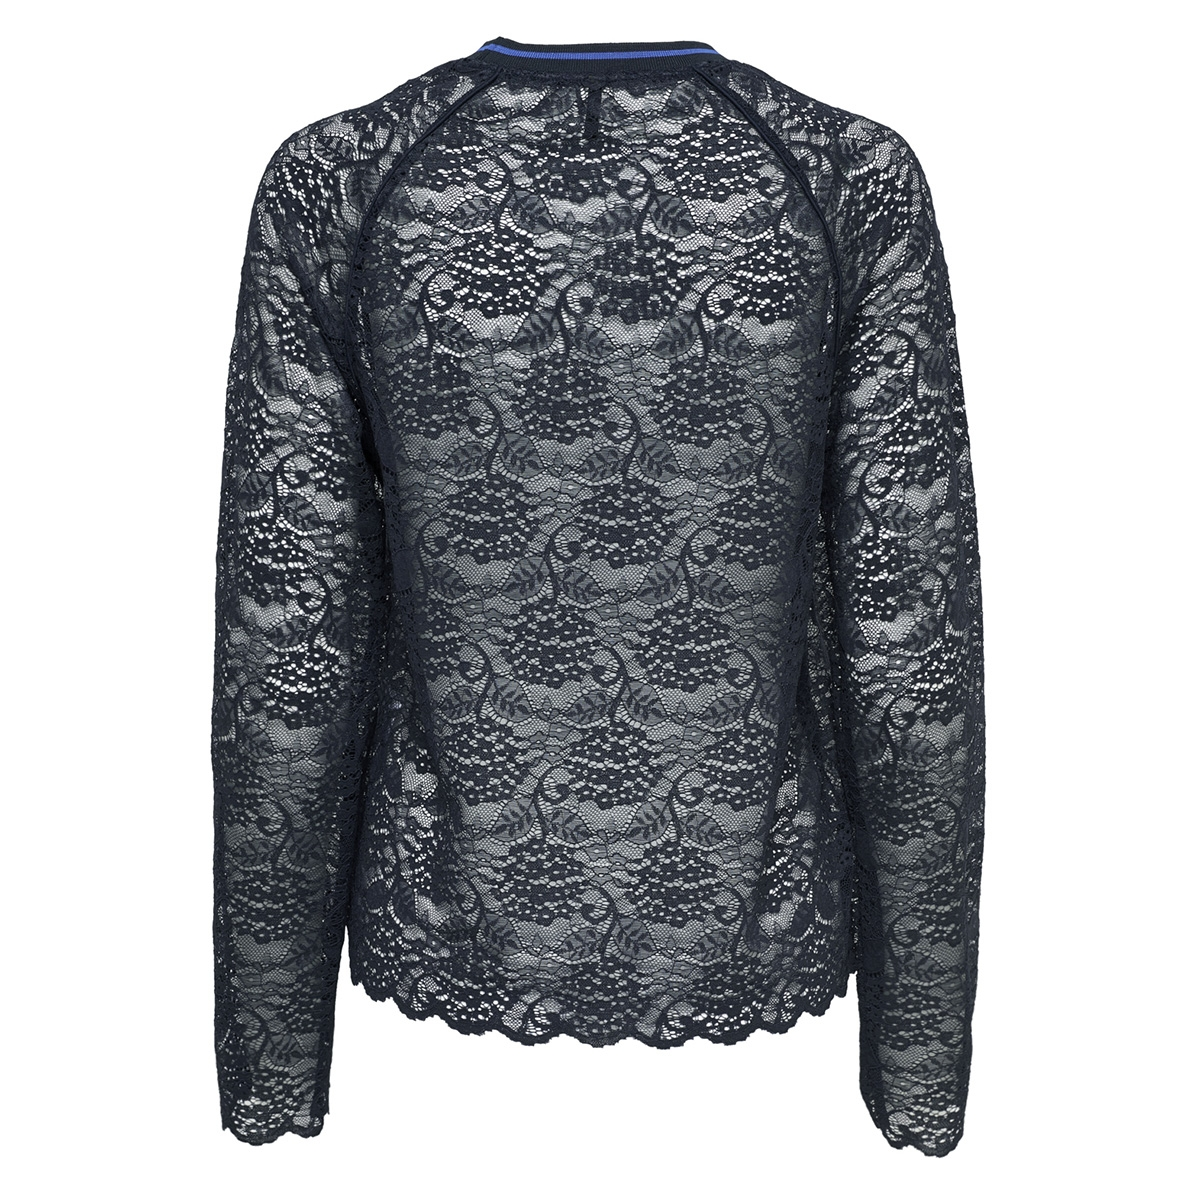 onlgwenny l/s top jrs 15164111 only t-shirt night sky/rib night